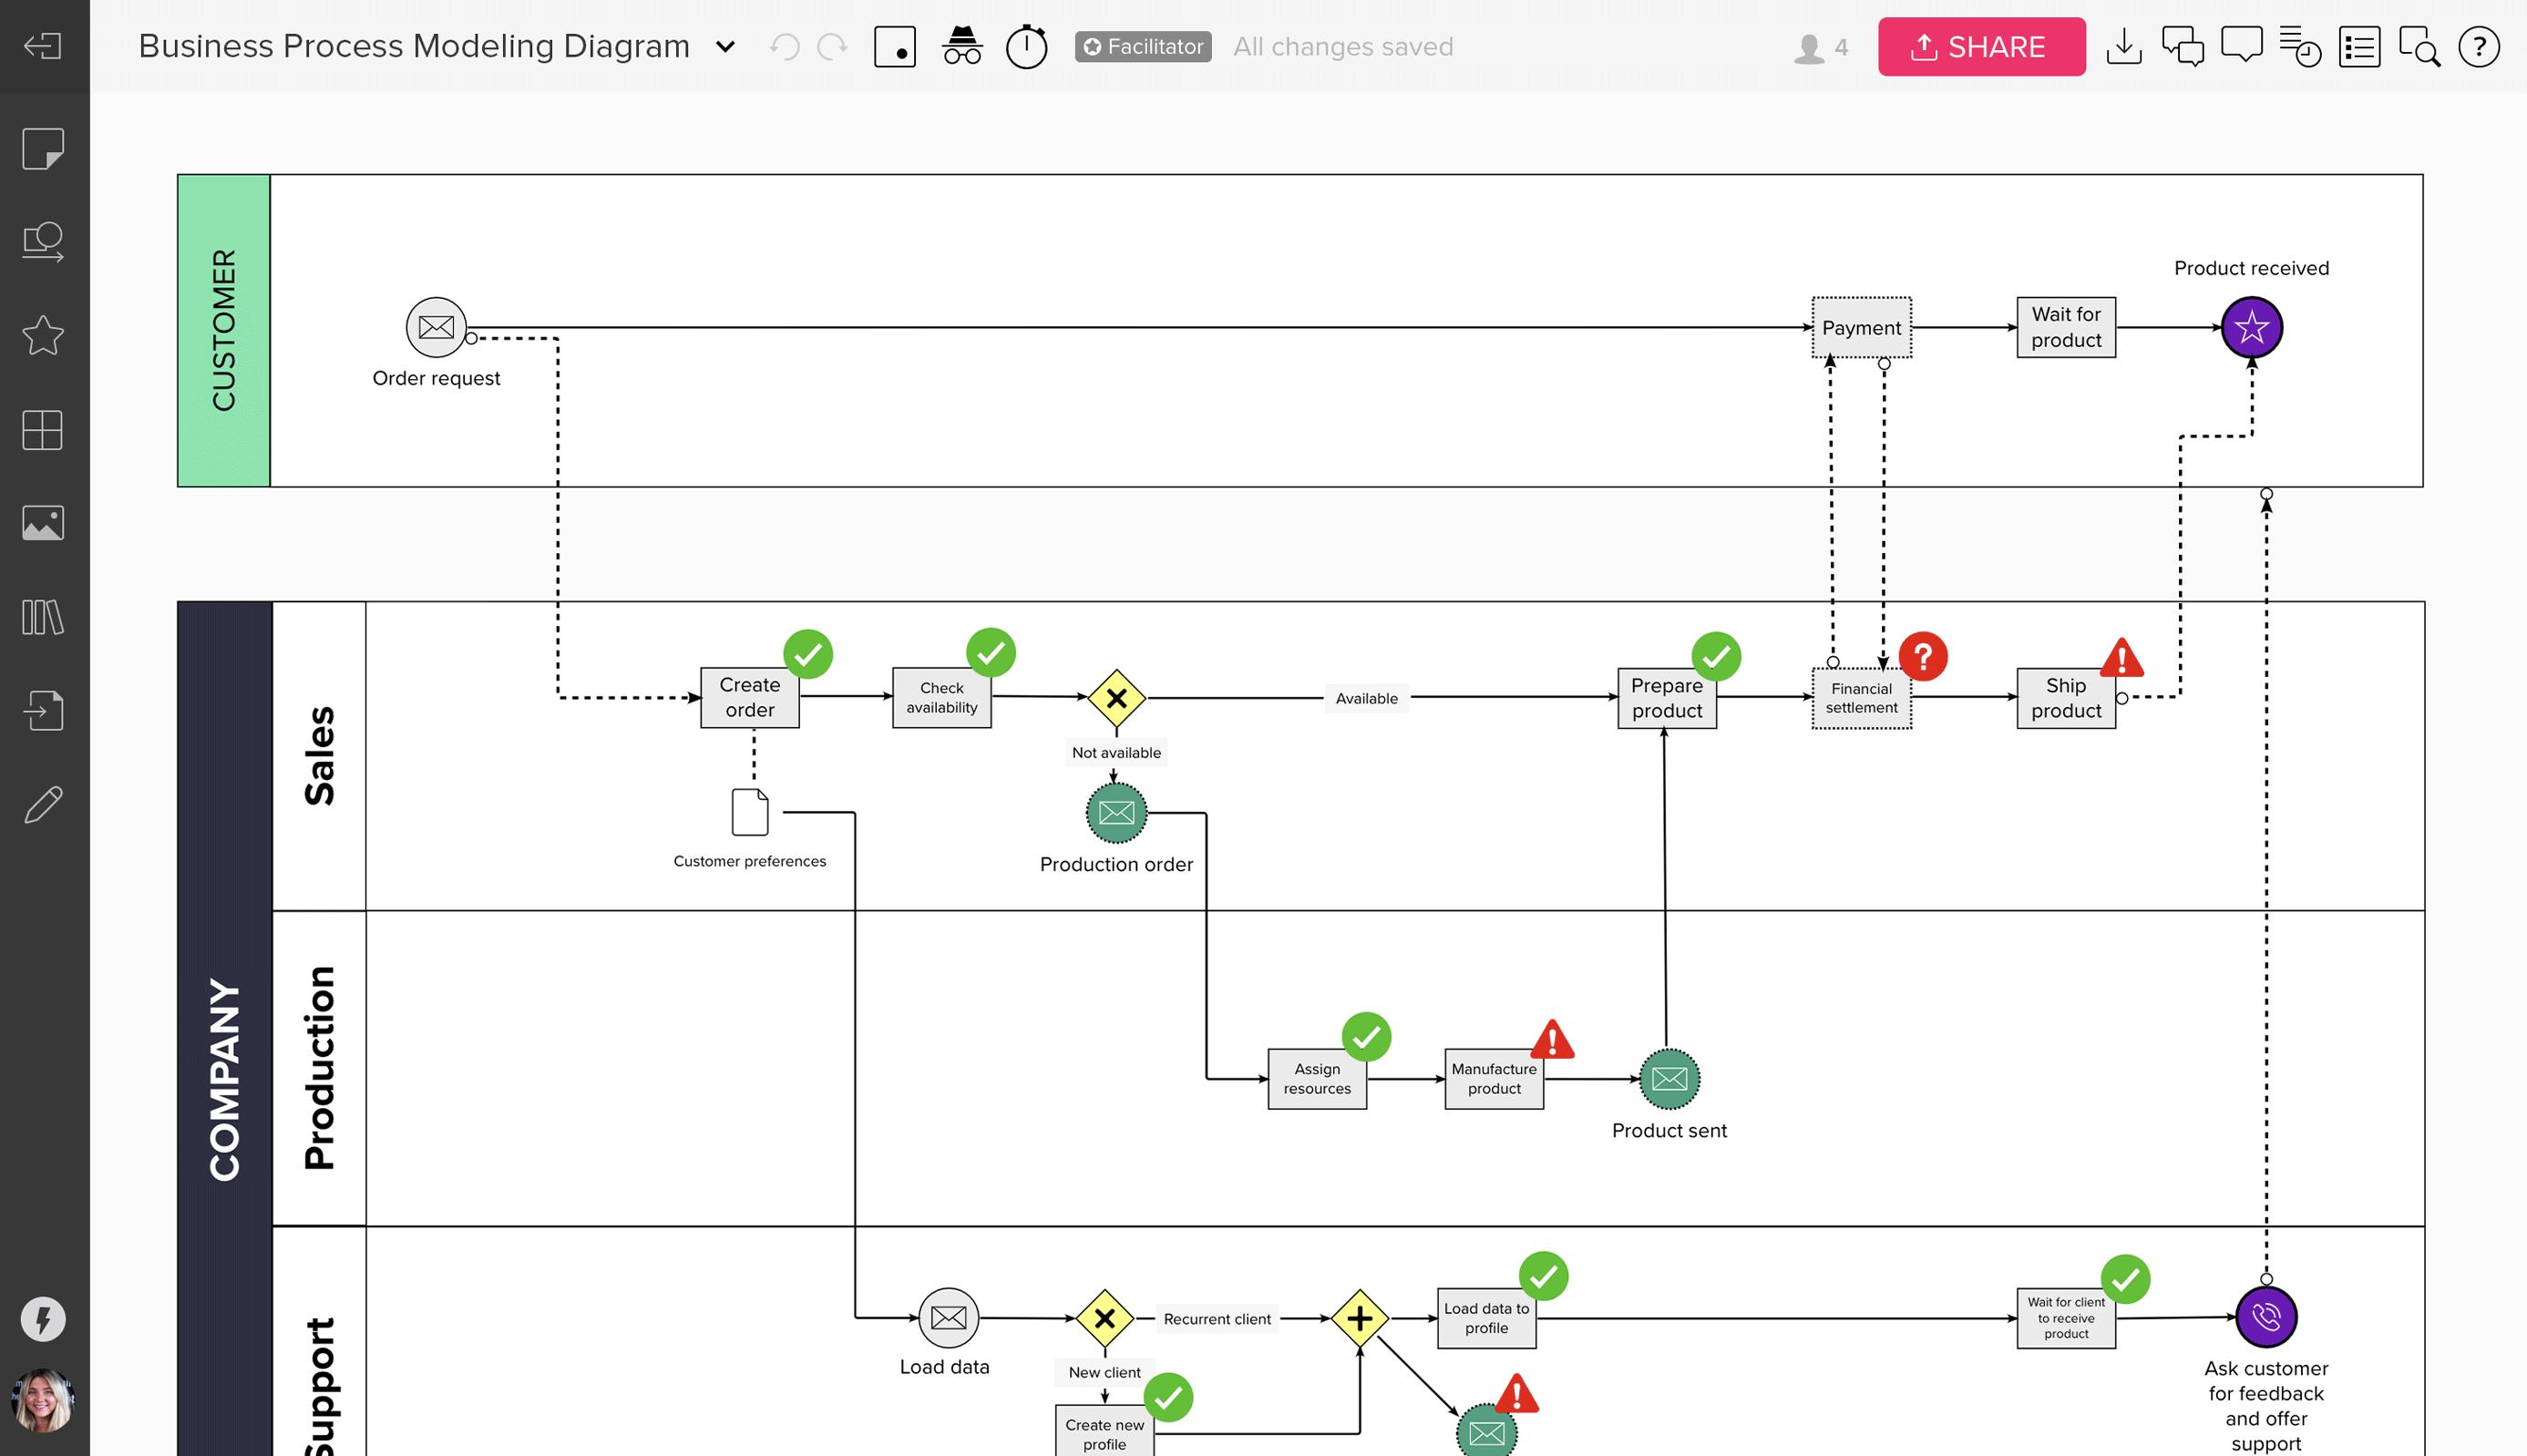 Business Process Model Diagram (BPMN)